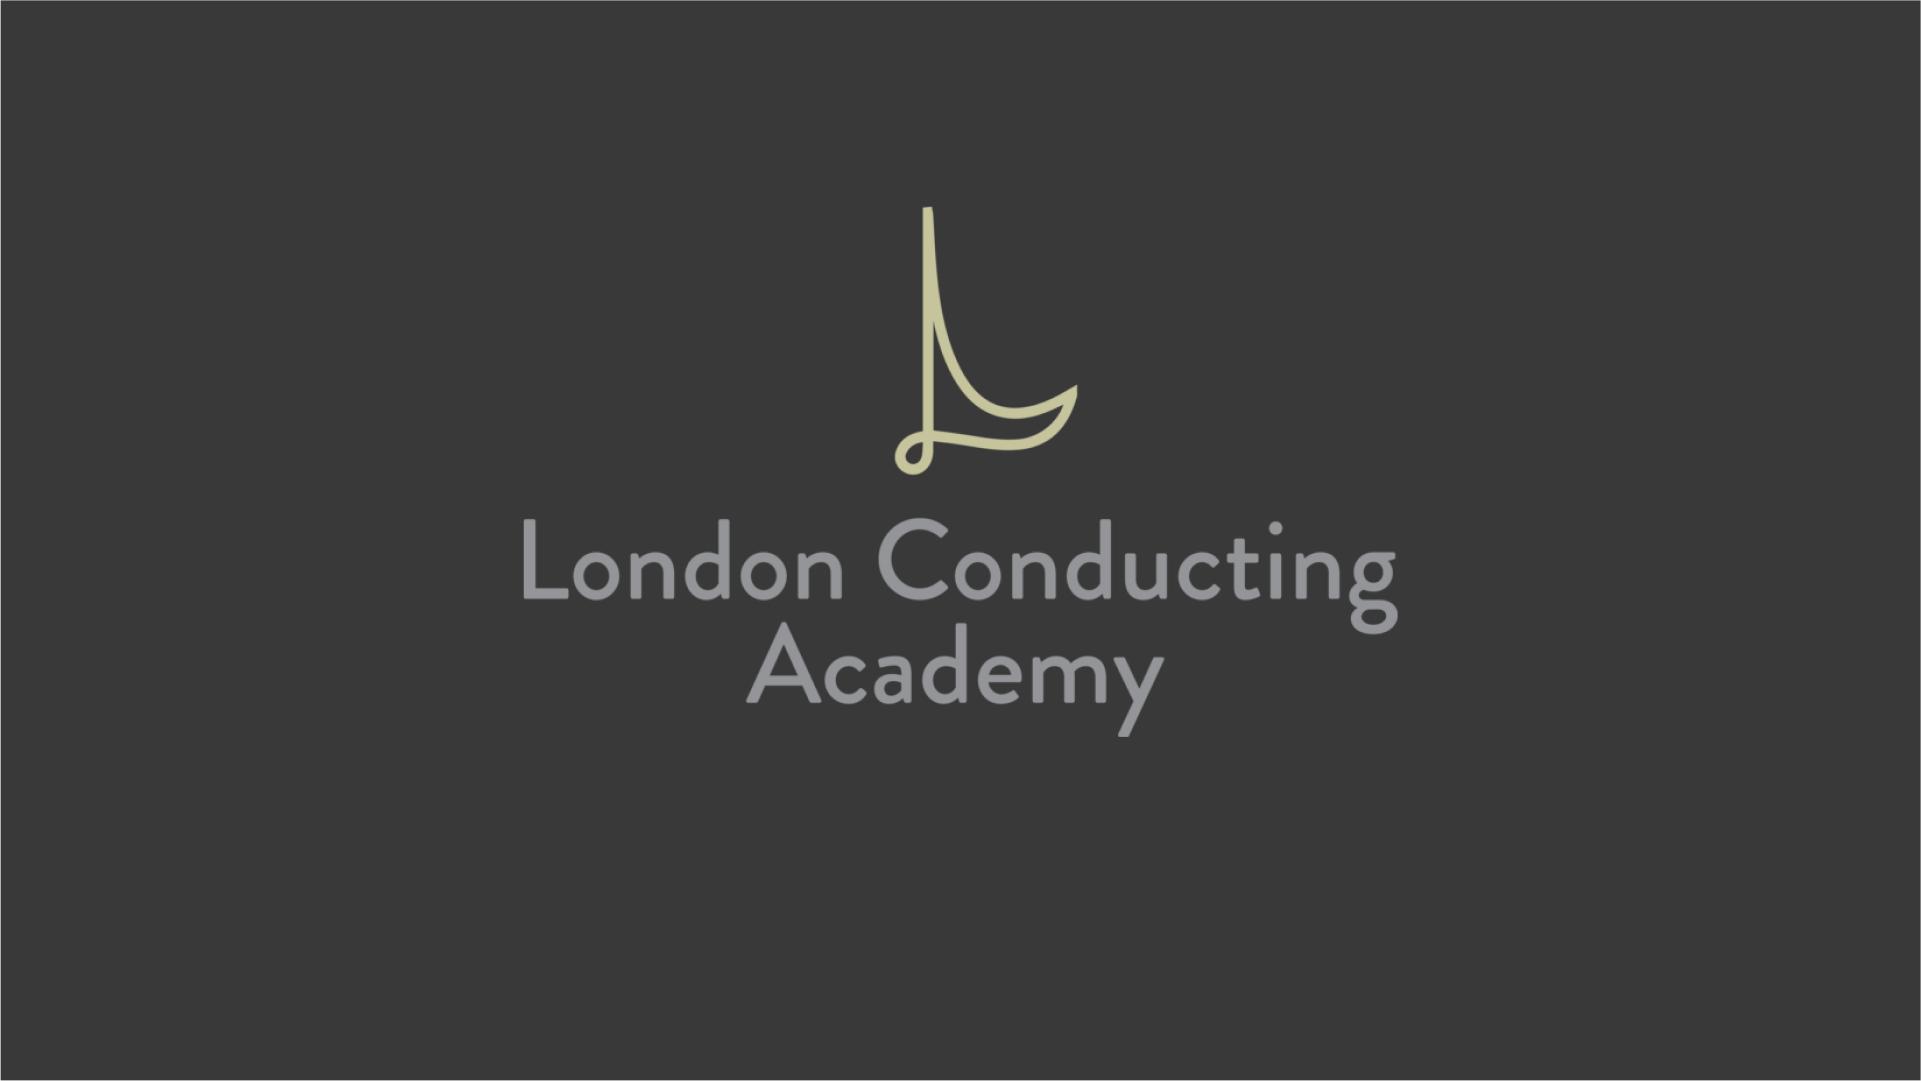 London Conducting Academy Logo on a dark background